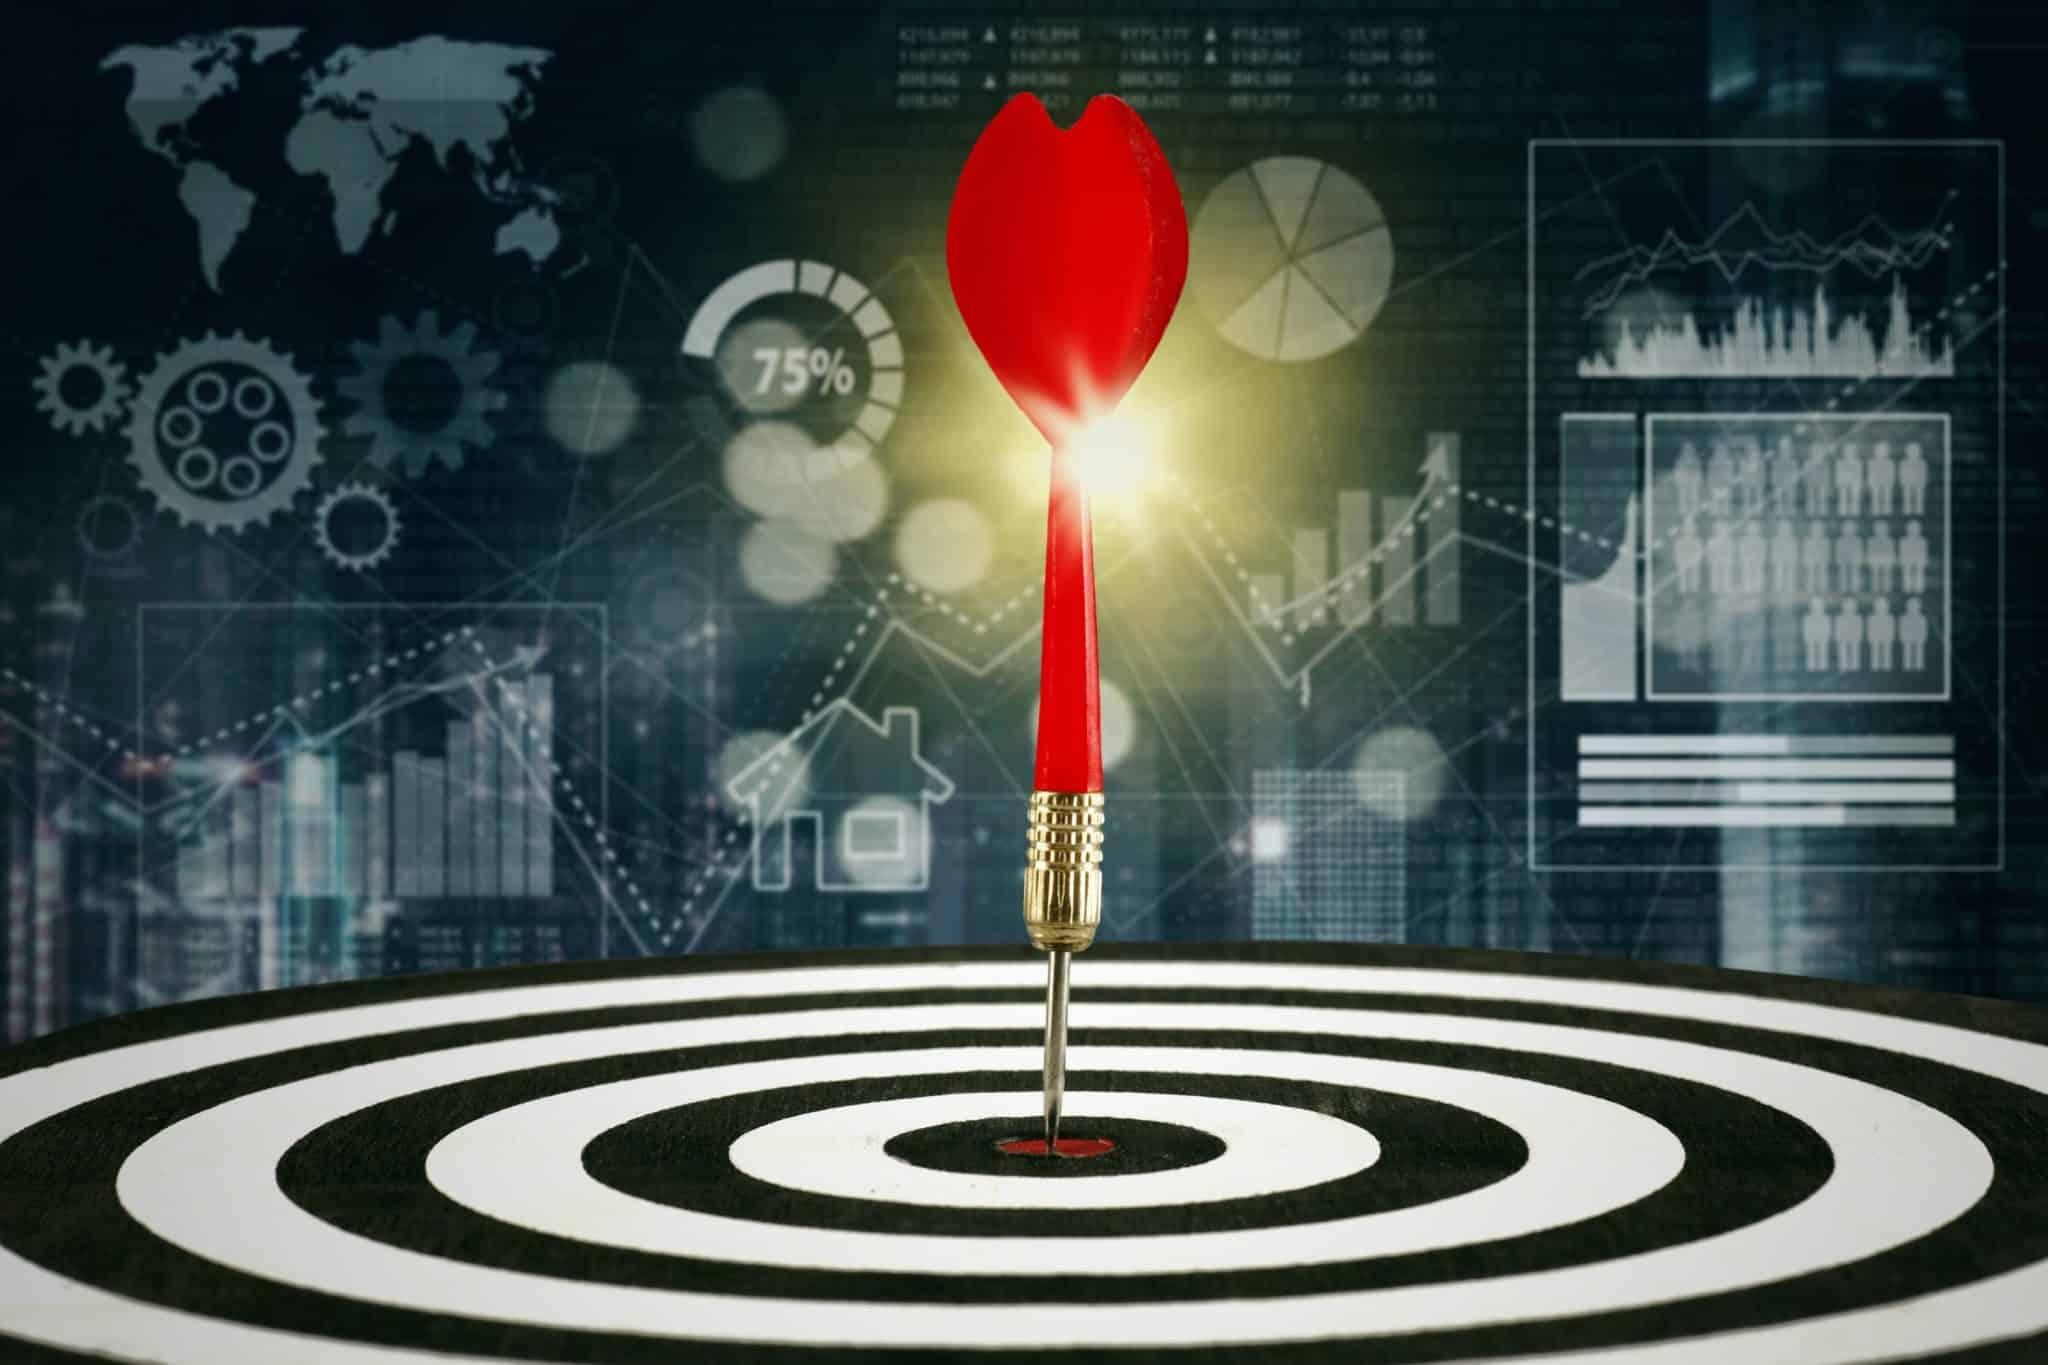 MaRisk Update: Risikotragfähigkeit - SREP - ICAAP